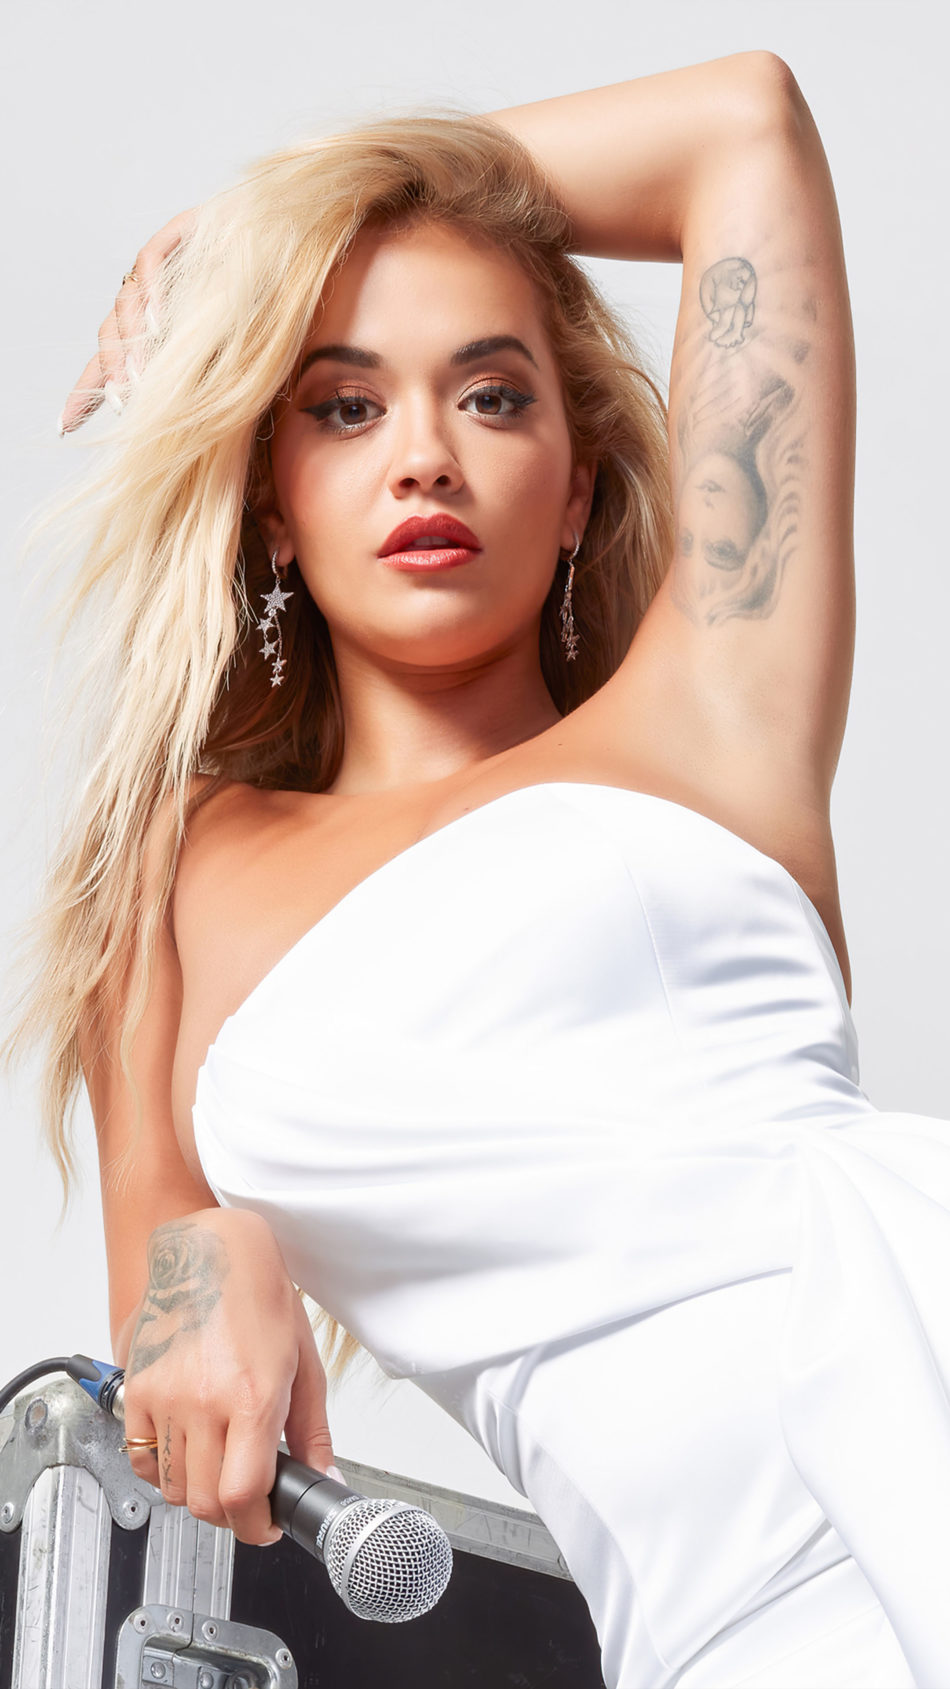 Rita Ora In White Dress Photoshoot 4K Ultra HD Mobile Wallpaper